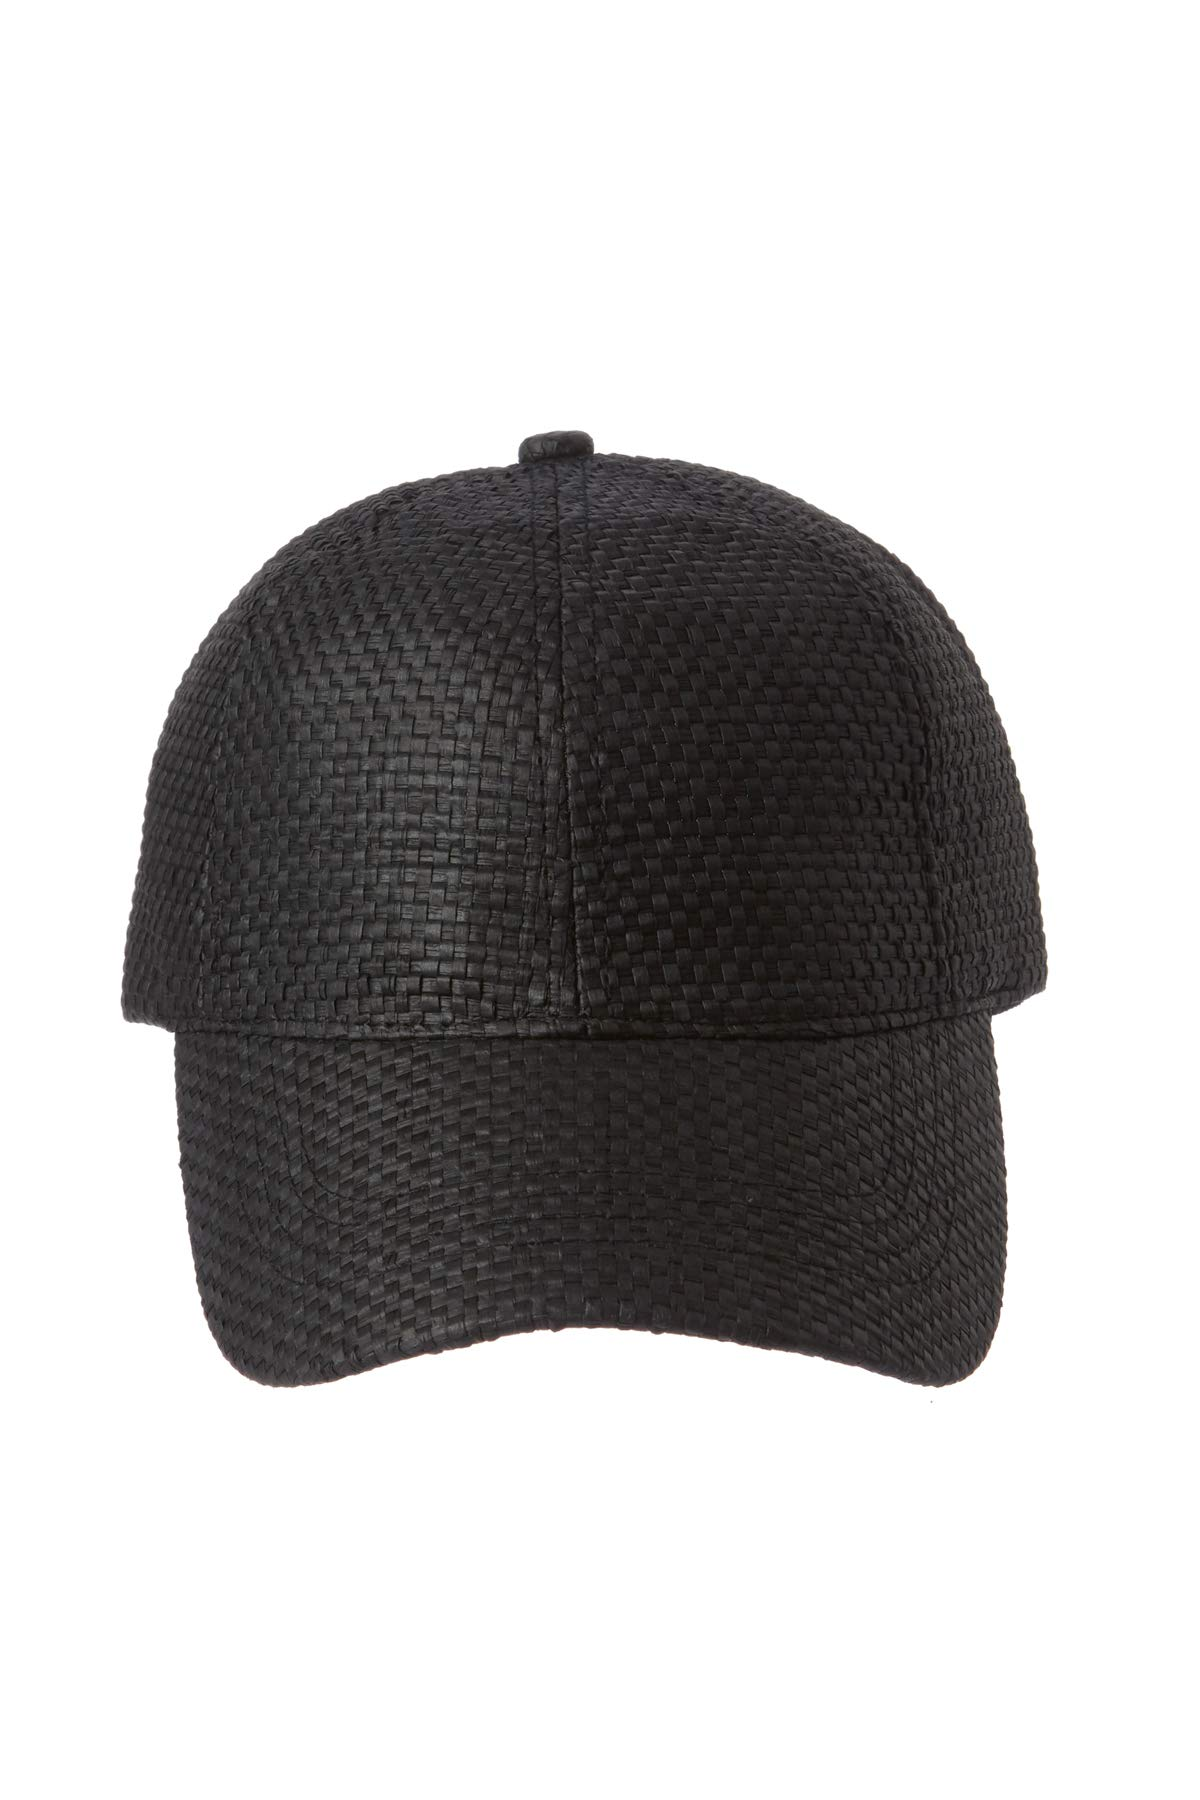 Wyeth Hats Black Woven Straw Baseball Cap Black One